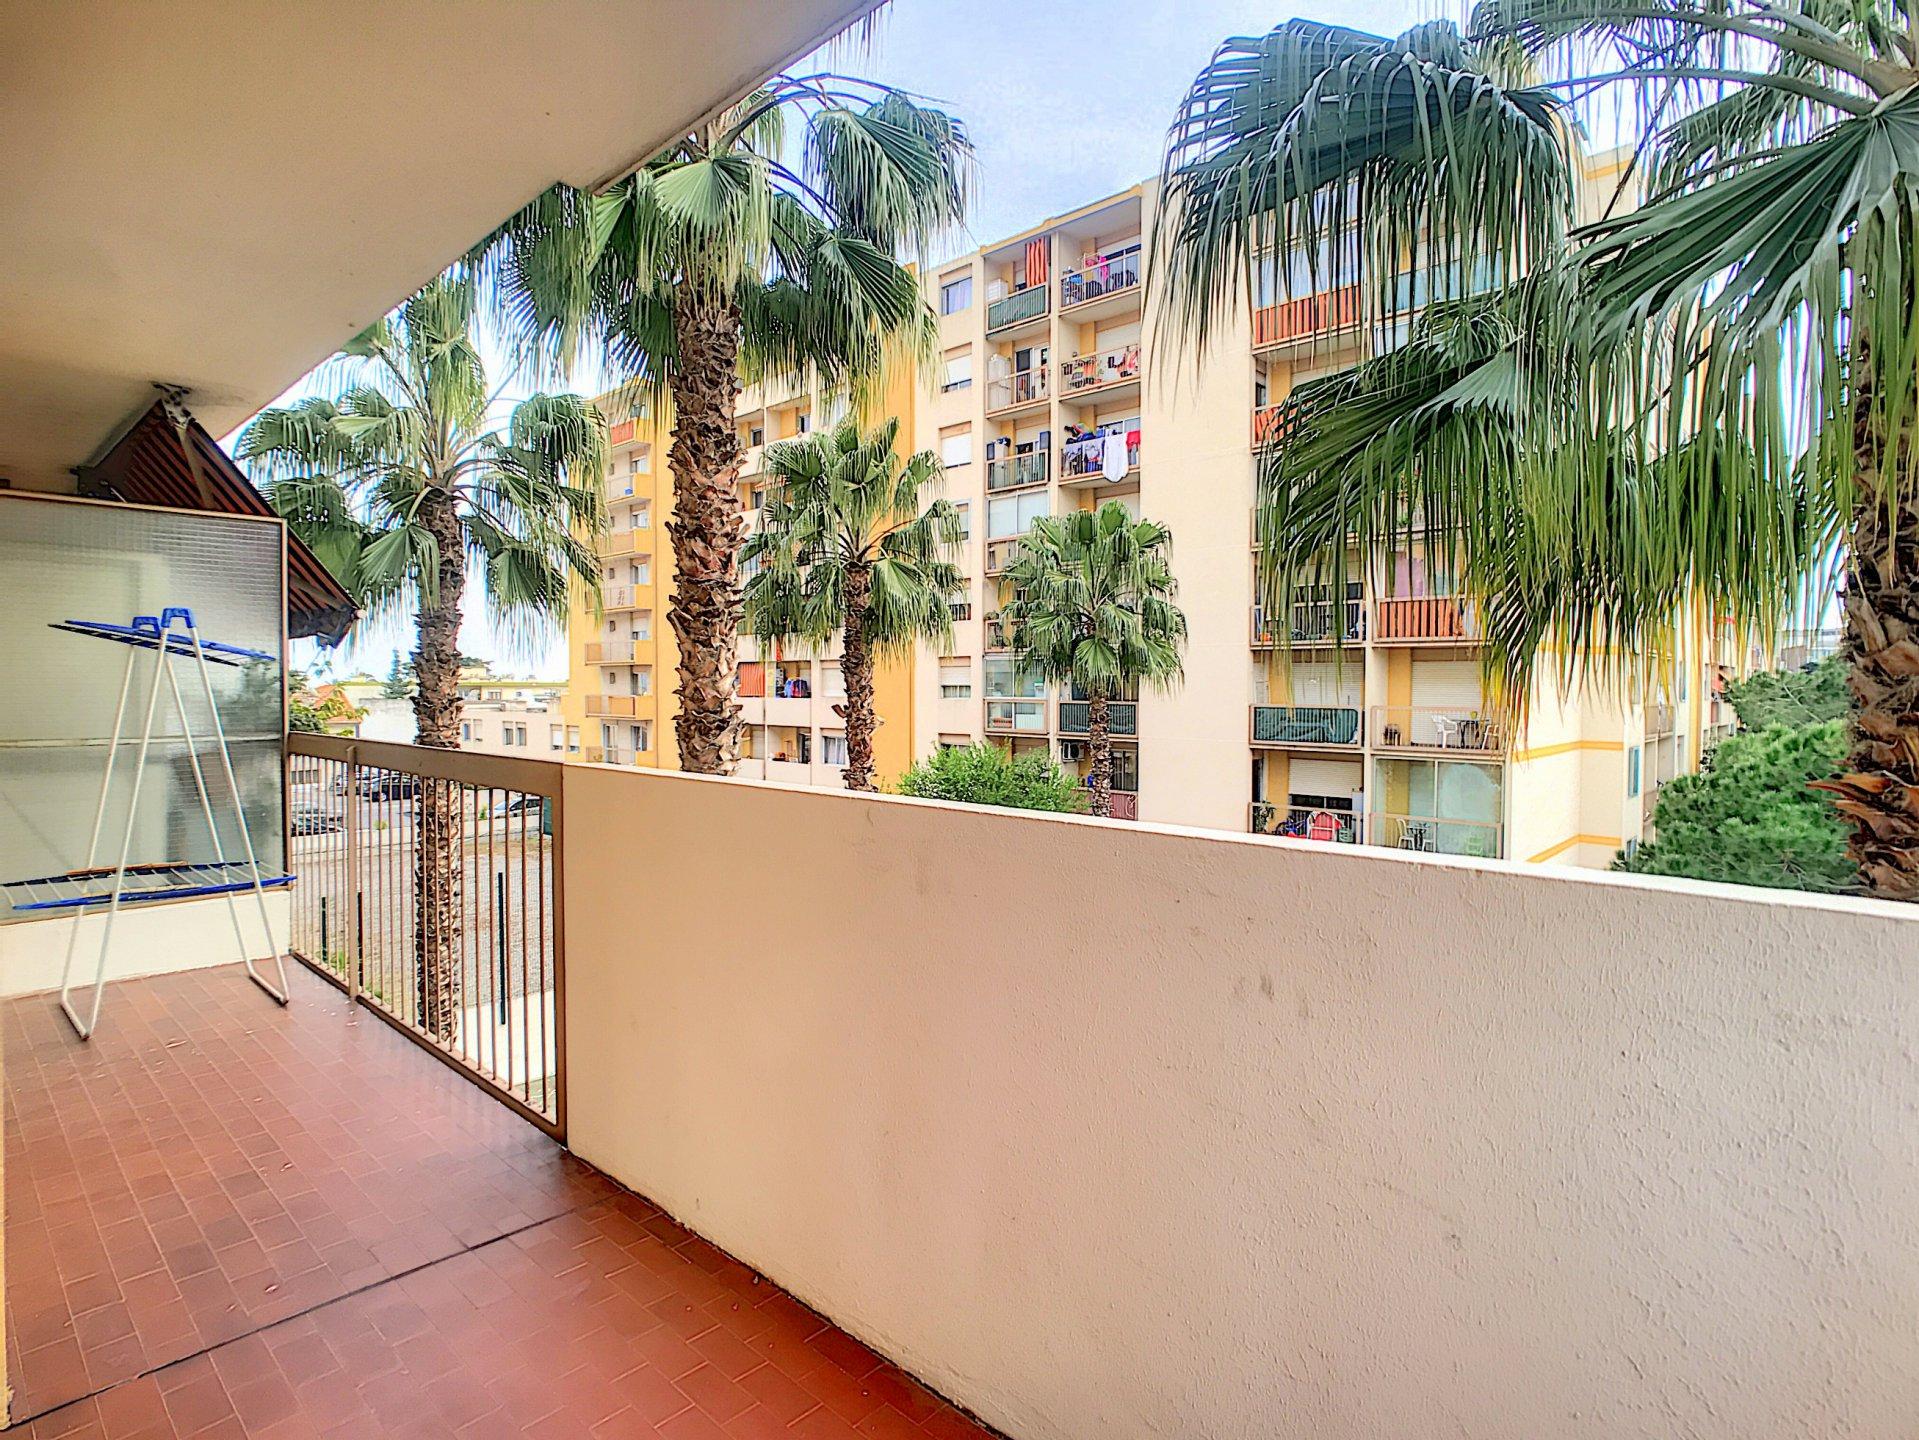 VENTE Appartement 3P Nice Ouest Lanterne 2 Terrasses Proche Mer